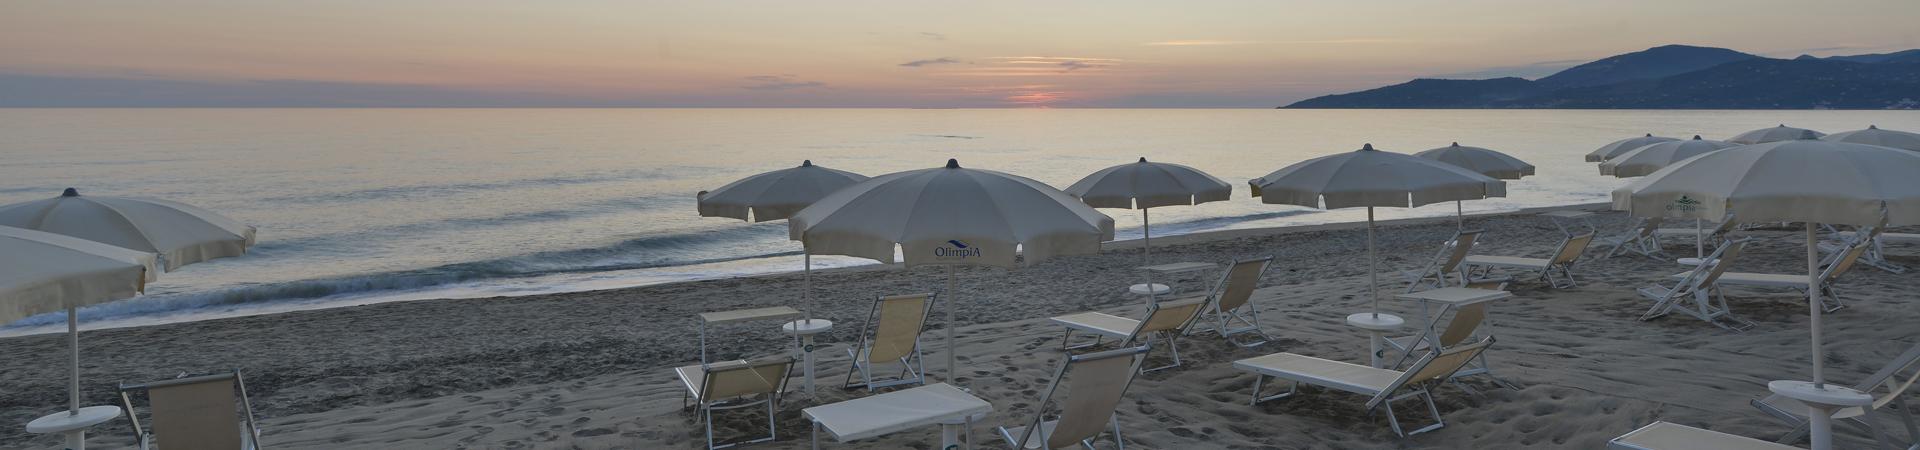 Olimpia-Cilento-Resort-slider2-sito